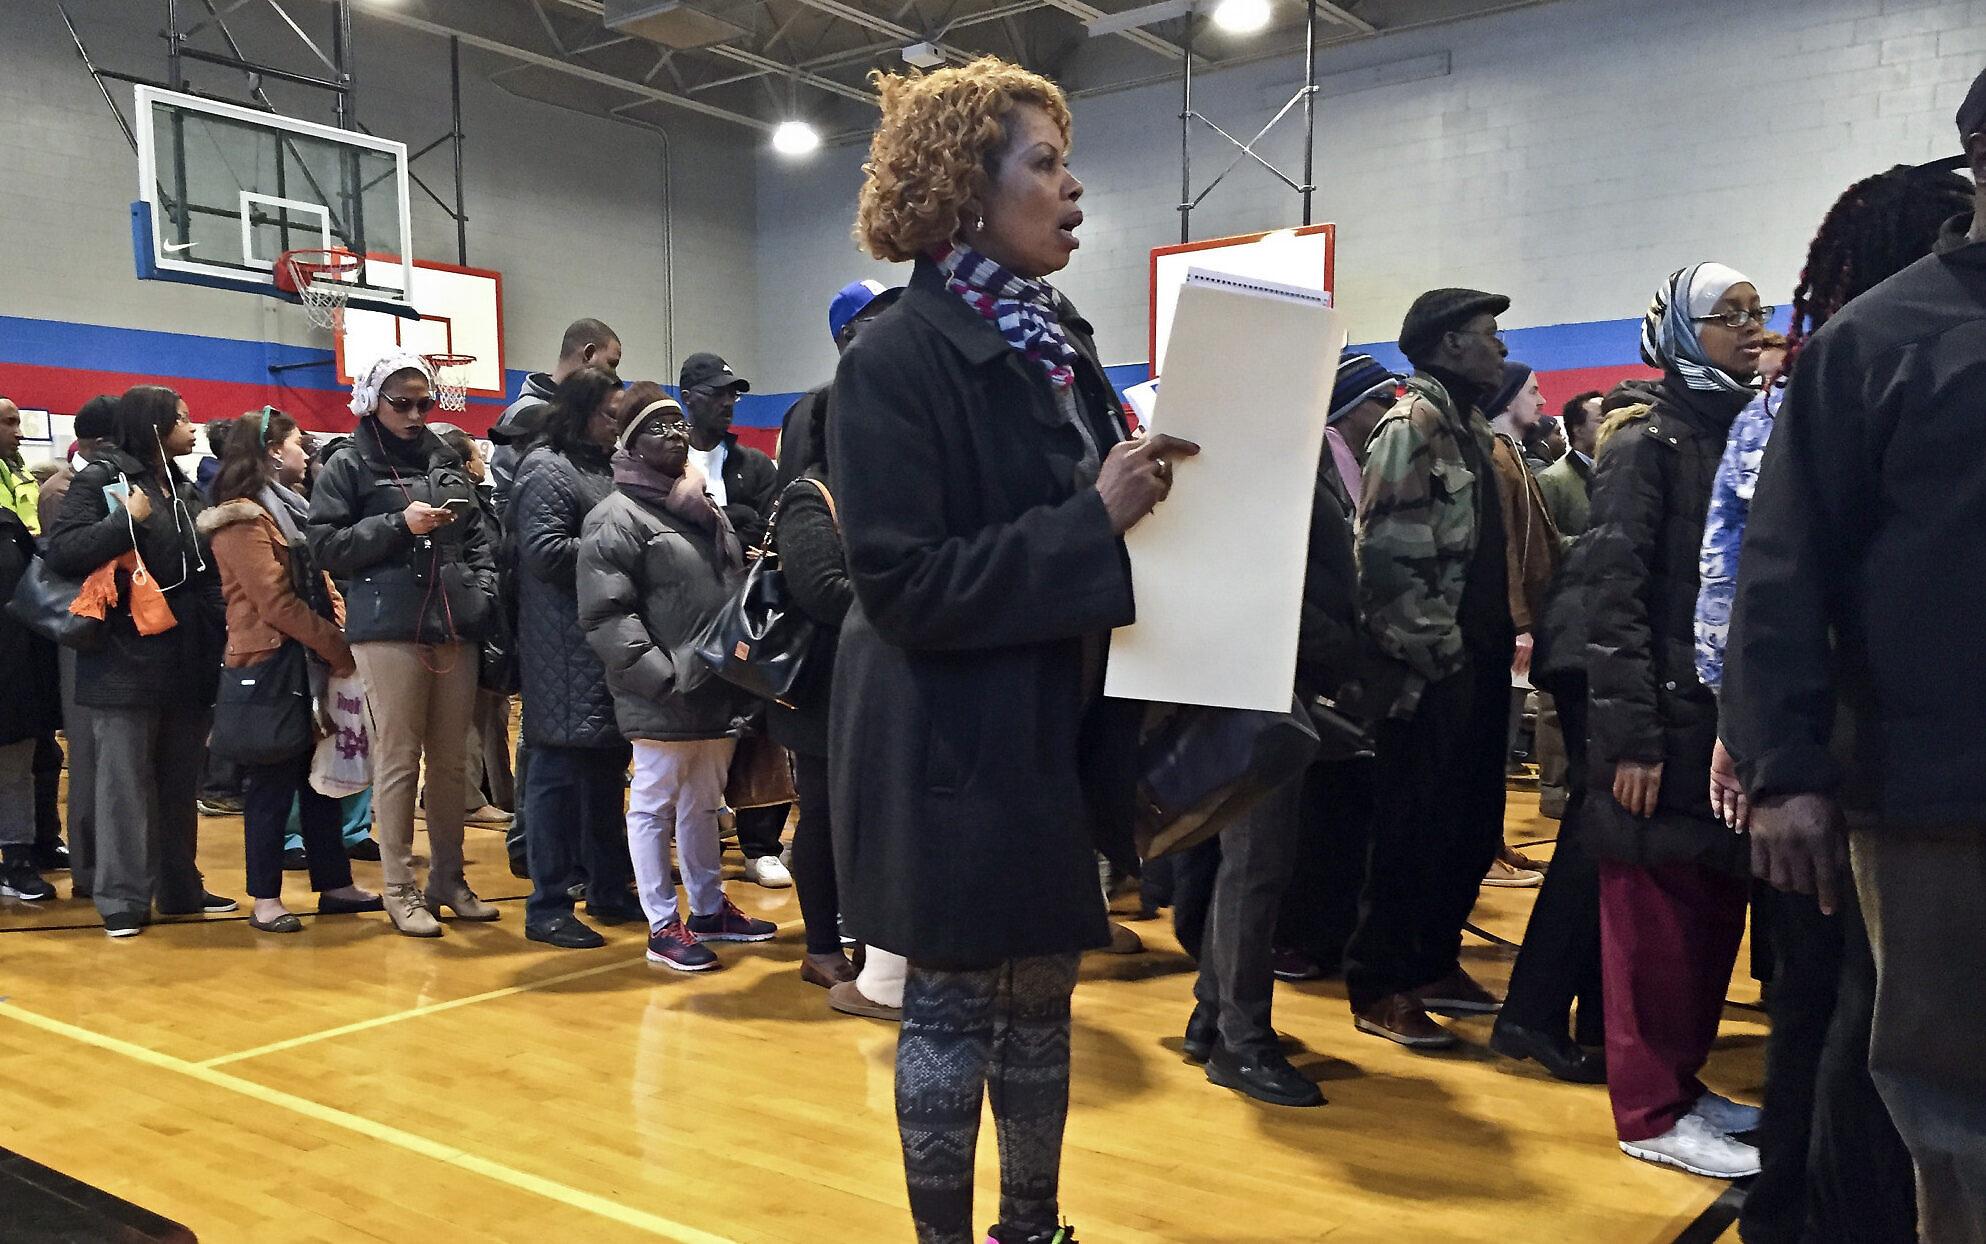 Trump's 2016 team accused of deterring black Americans from voting